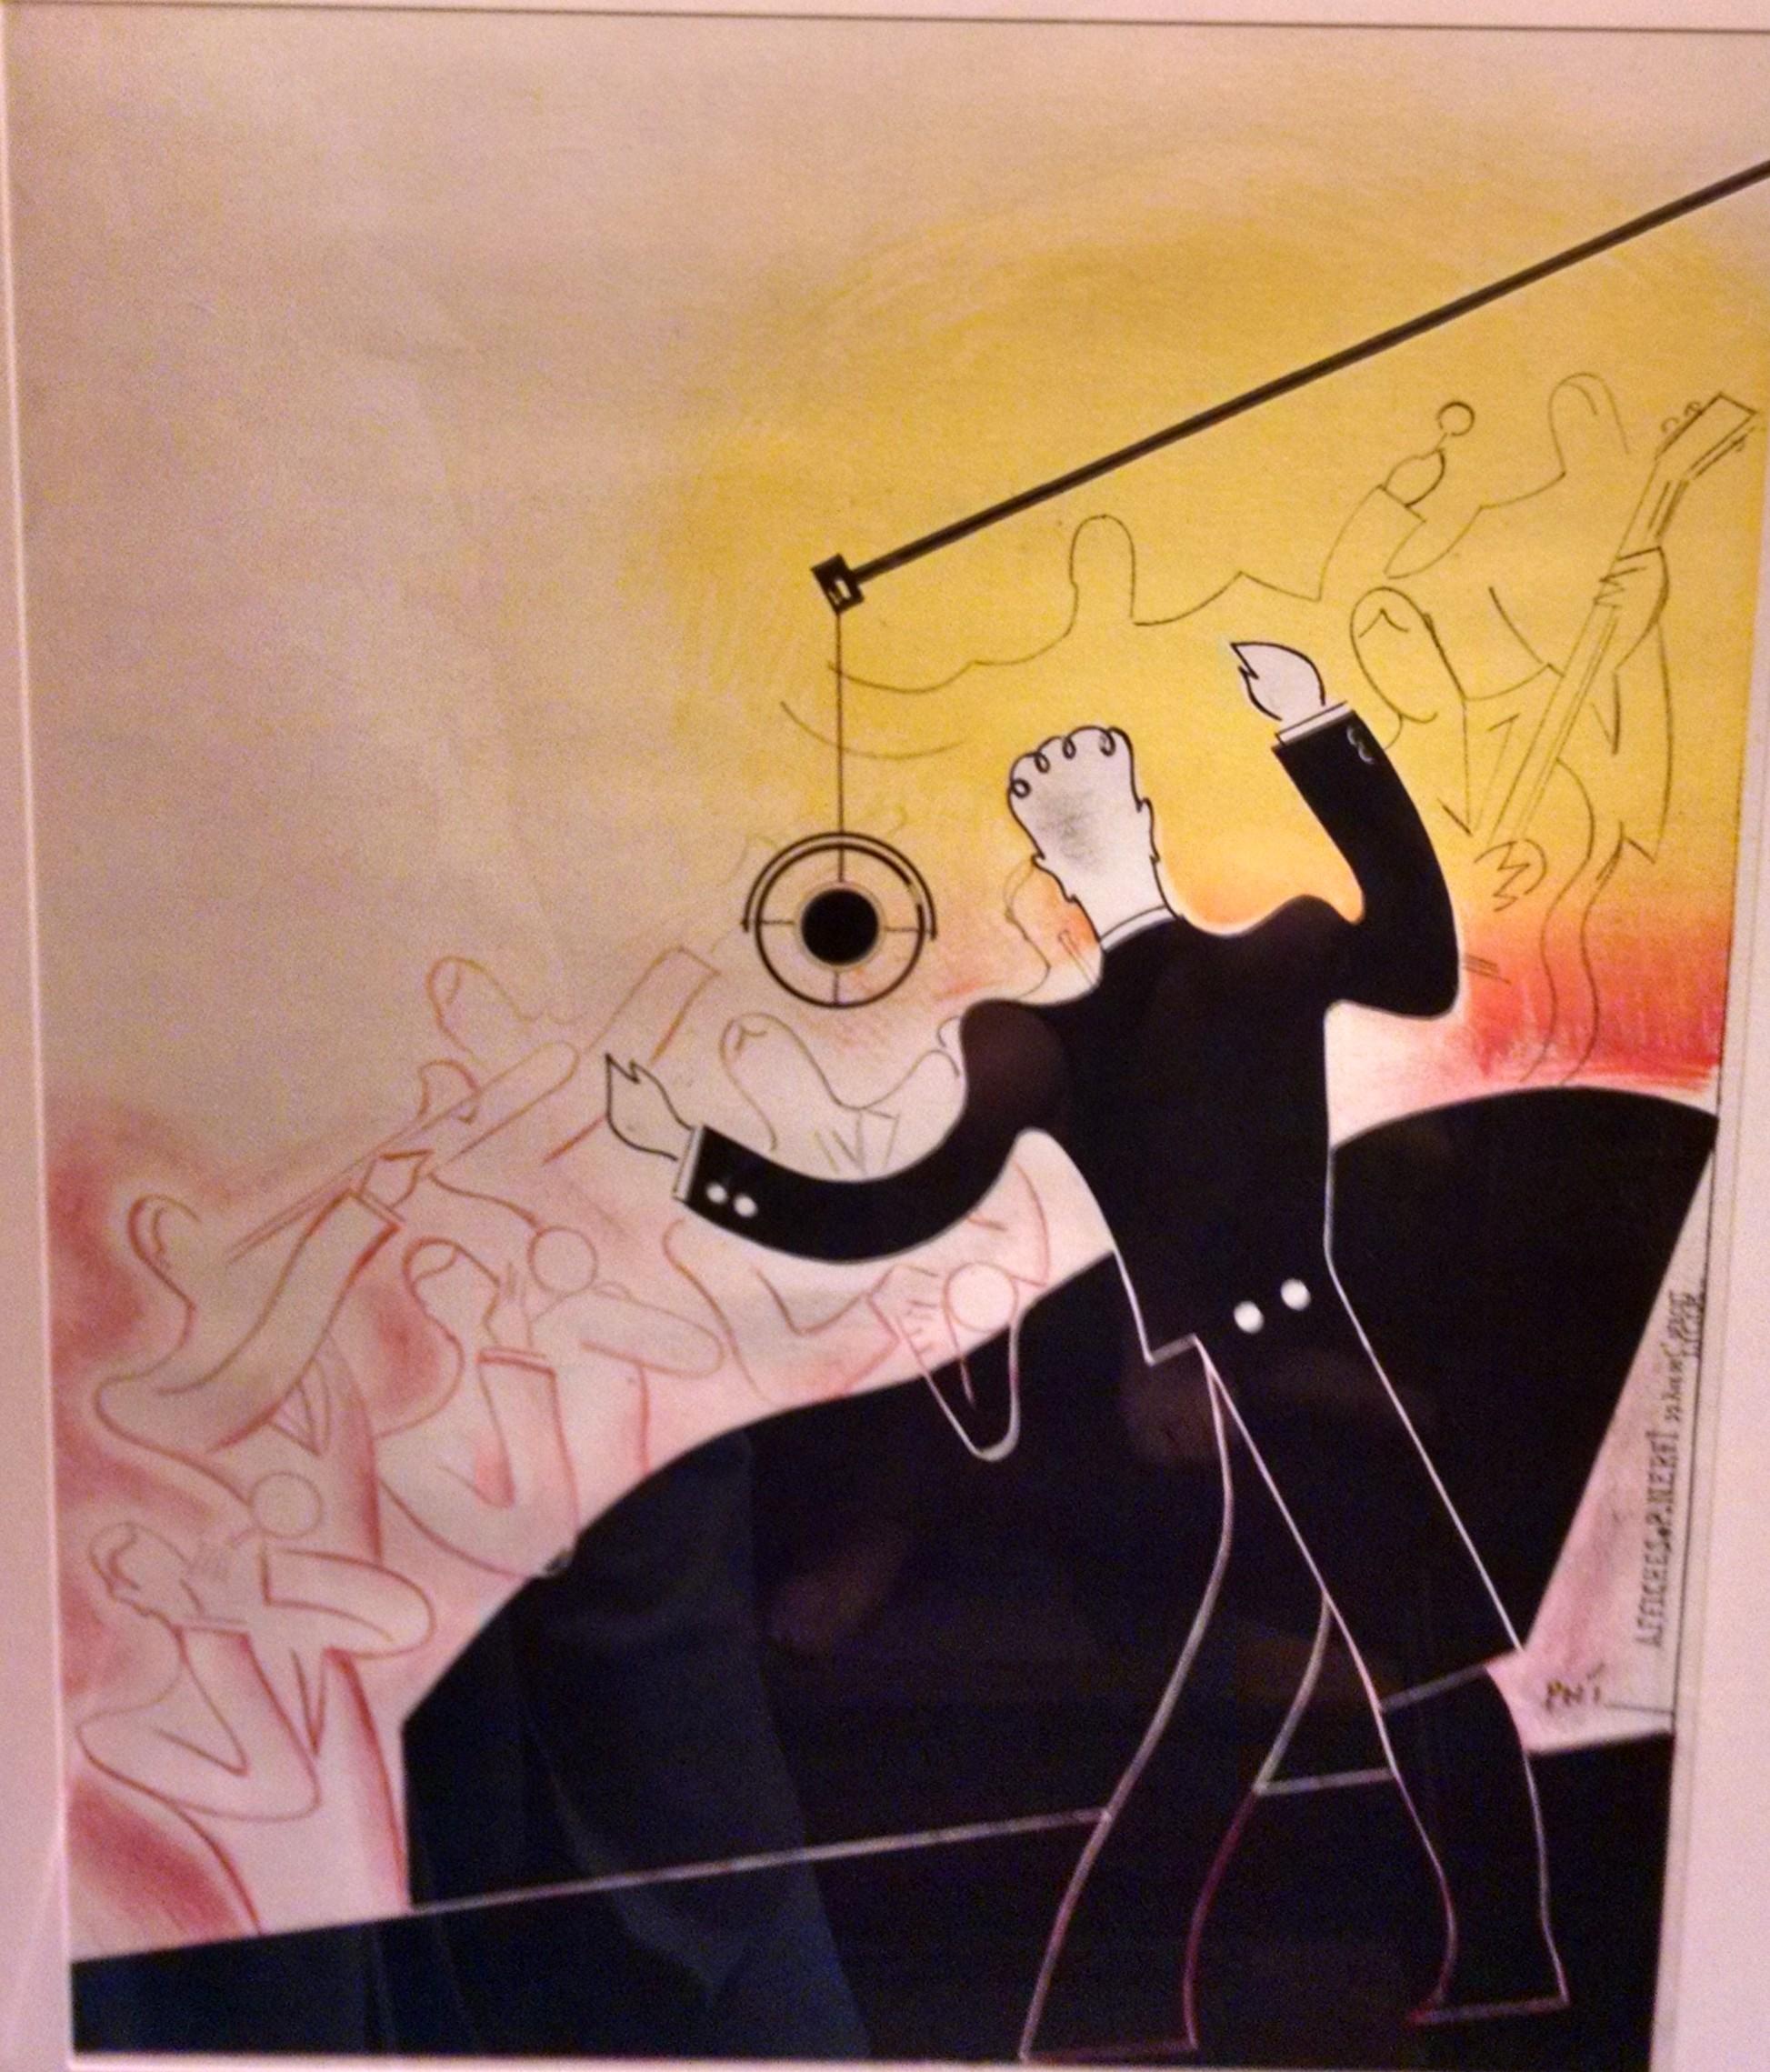 Phi Nefri Paul Art Deco Poster 1935 Modernism